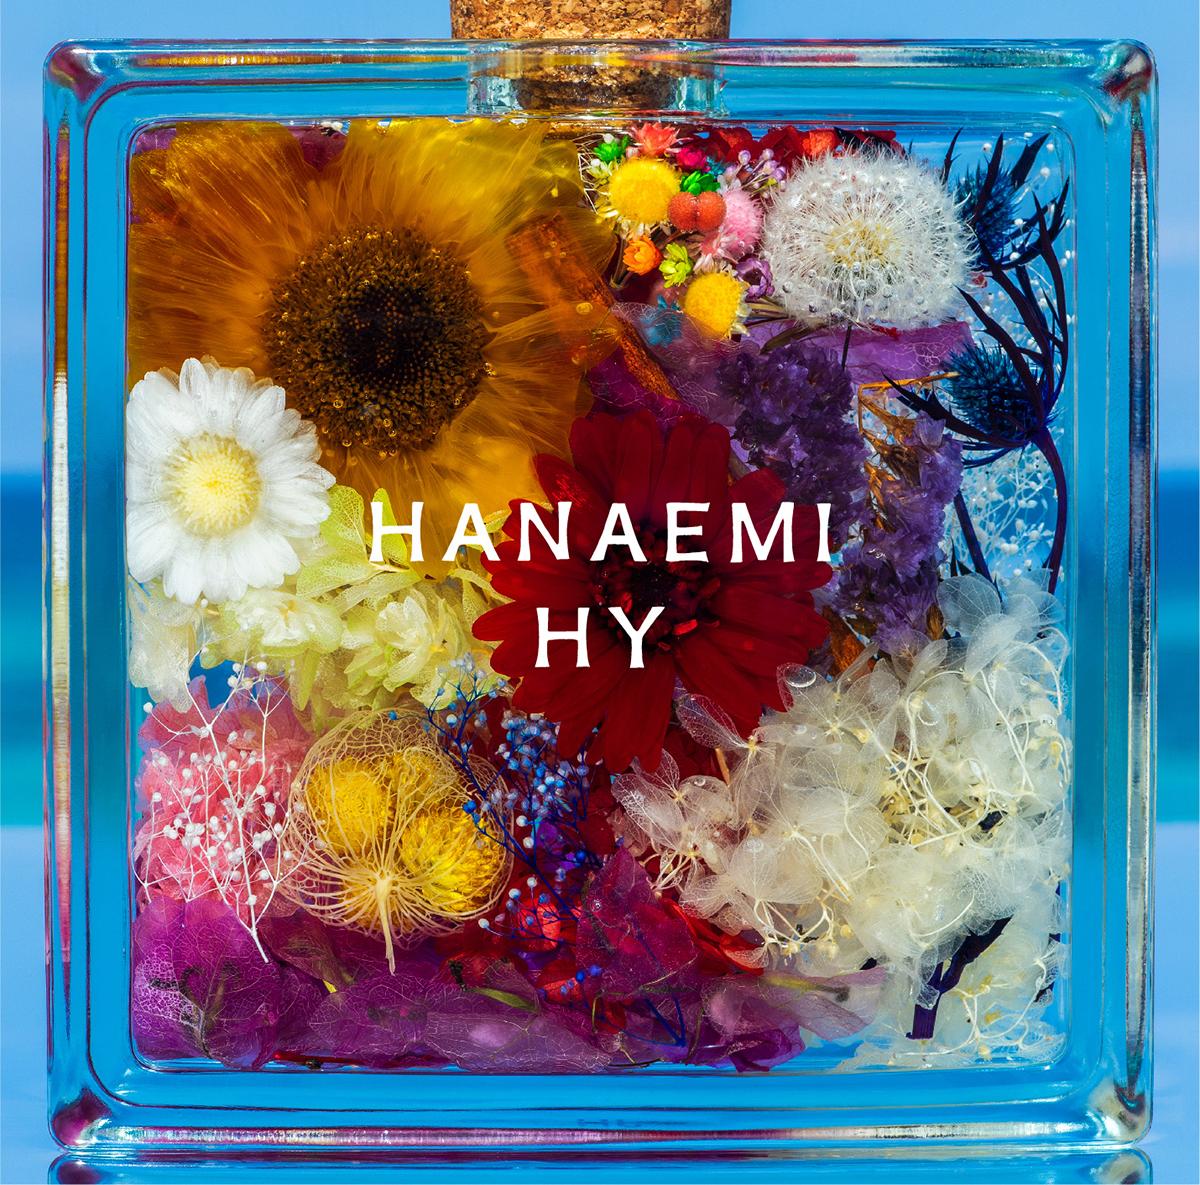 HY 14thオリジナルアルバム「HANAEMI」限定盤